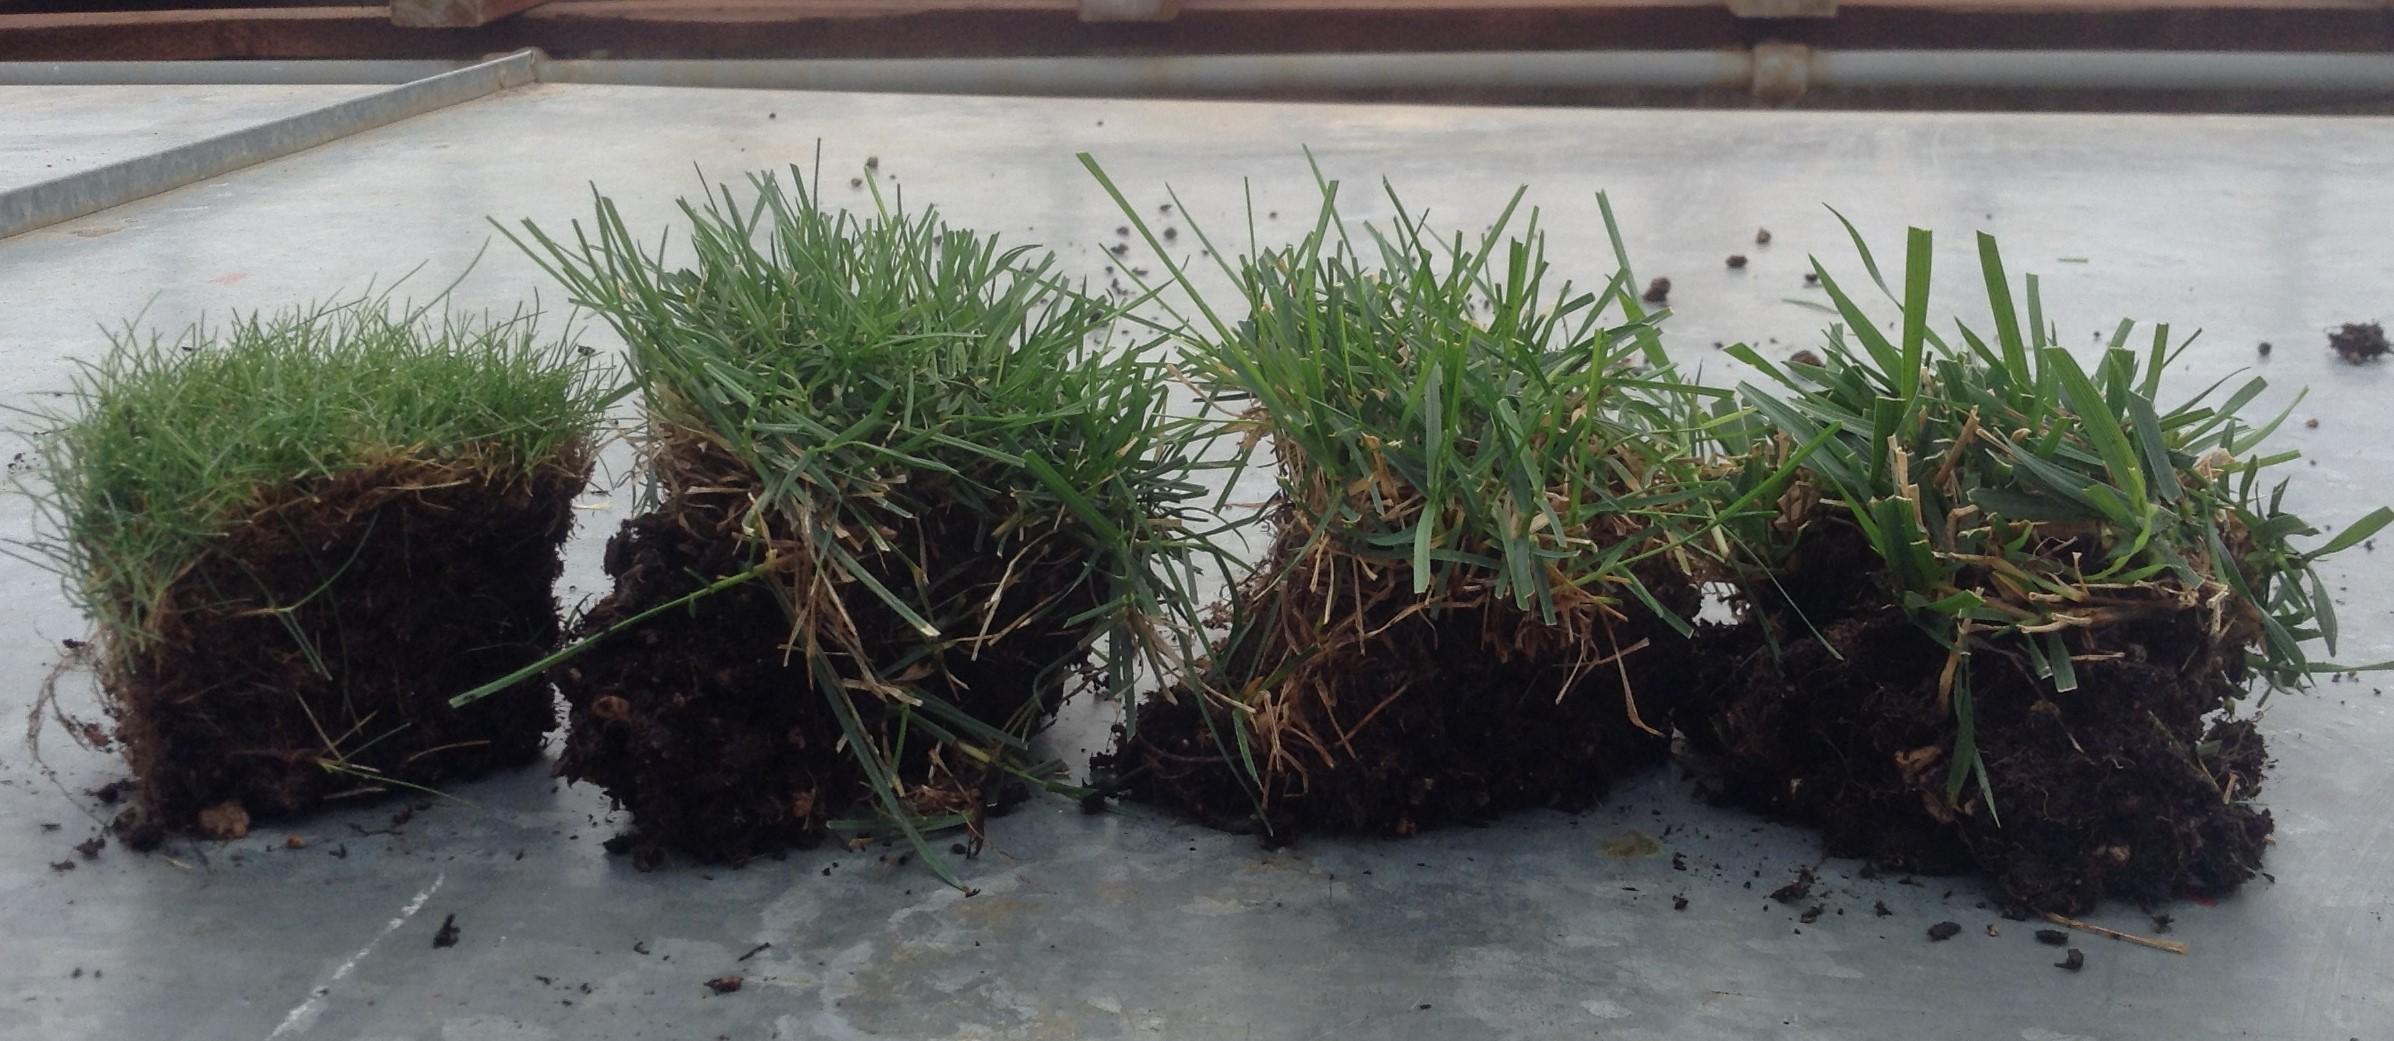 Photo: Alec Kowalewski, © Oregon State University Figure 2: Turfgrass species from fine to course leaf texture, left to right: fine fescue, perennial ryegrass, Kentucky bluegrass and tall fescue, Corvallis, Oregon.